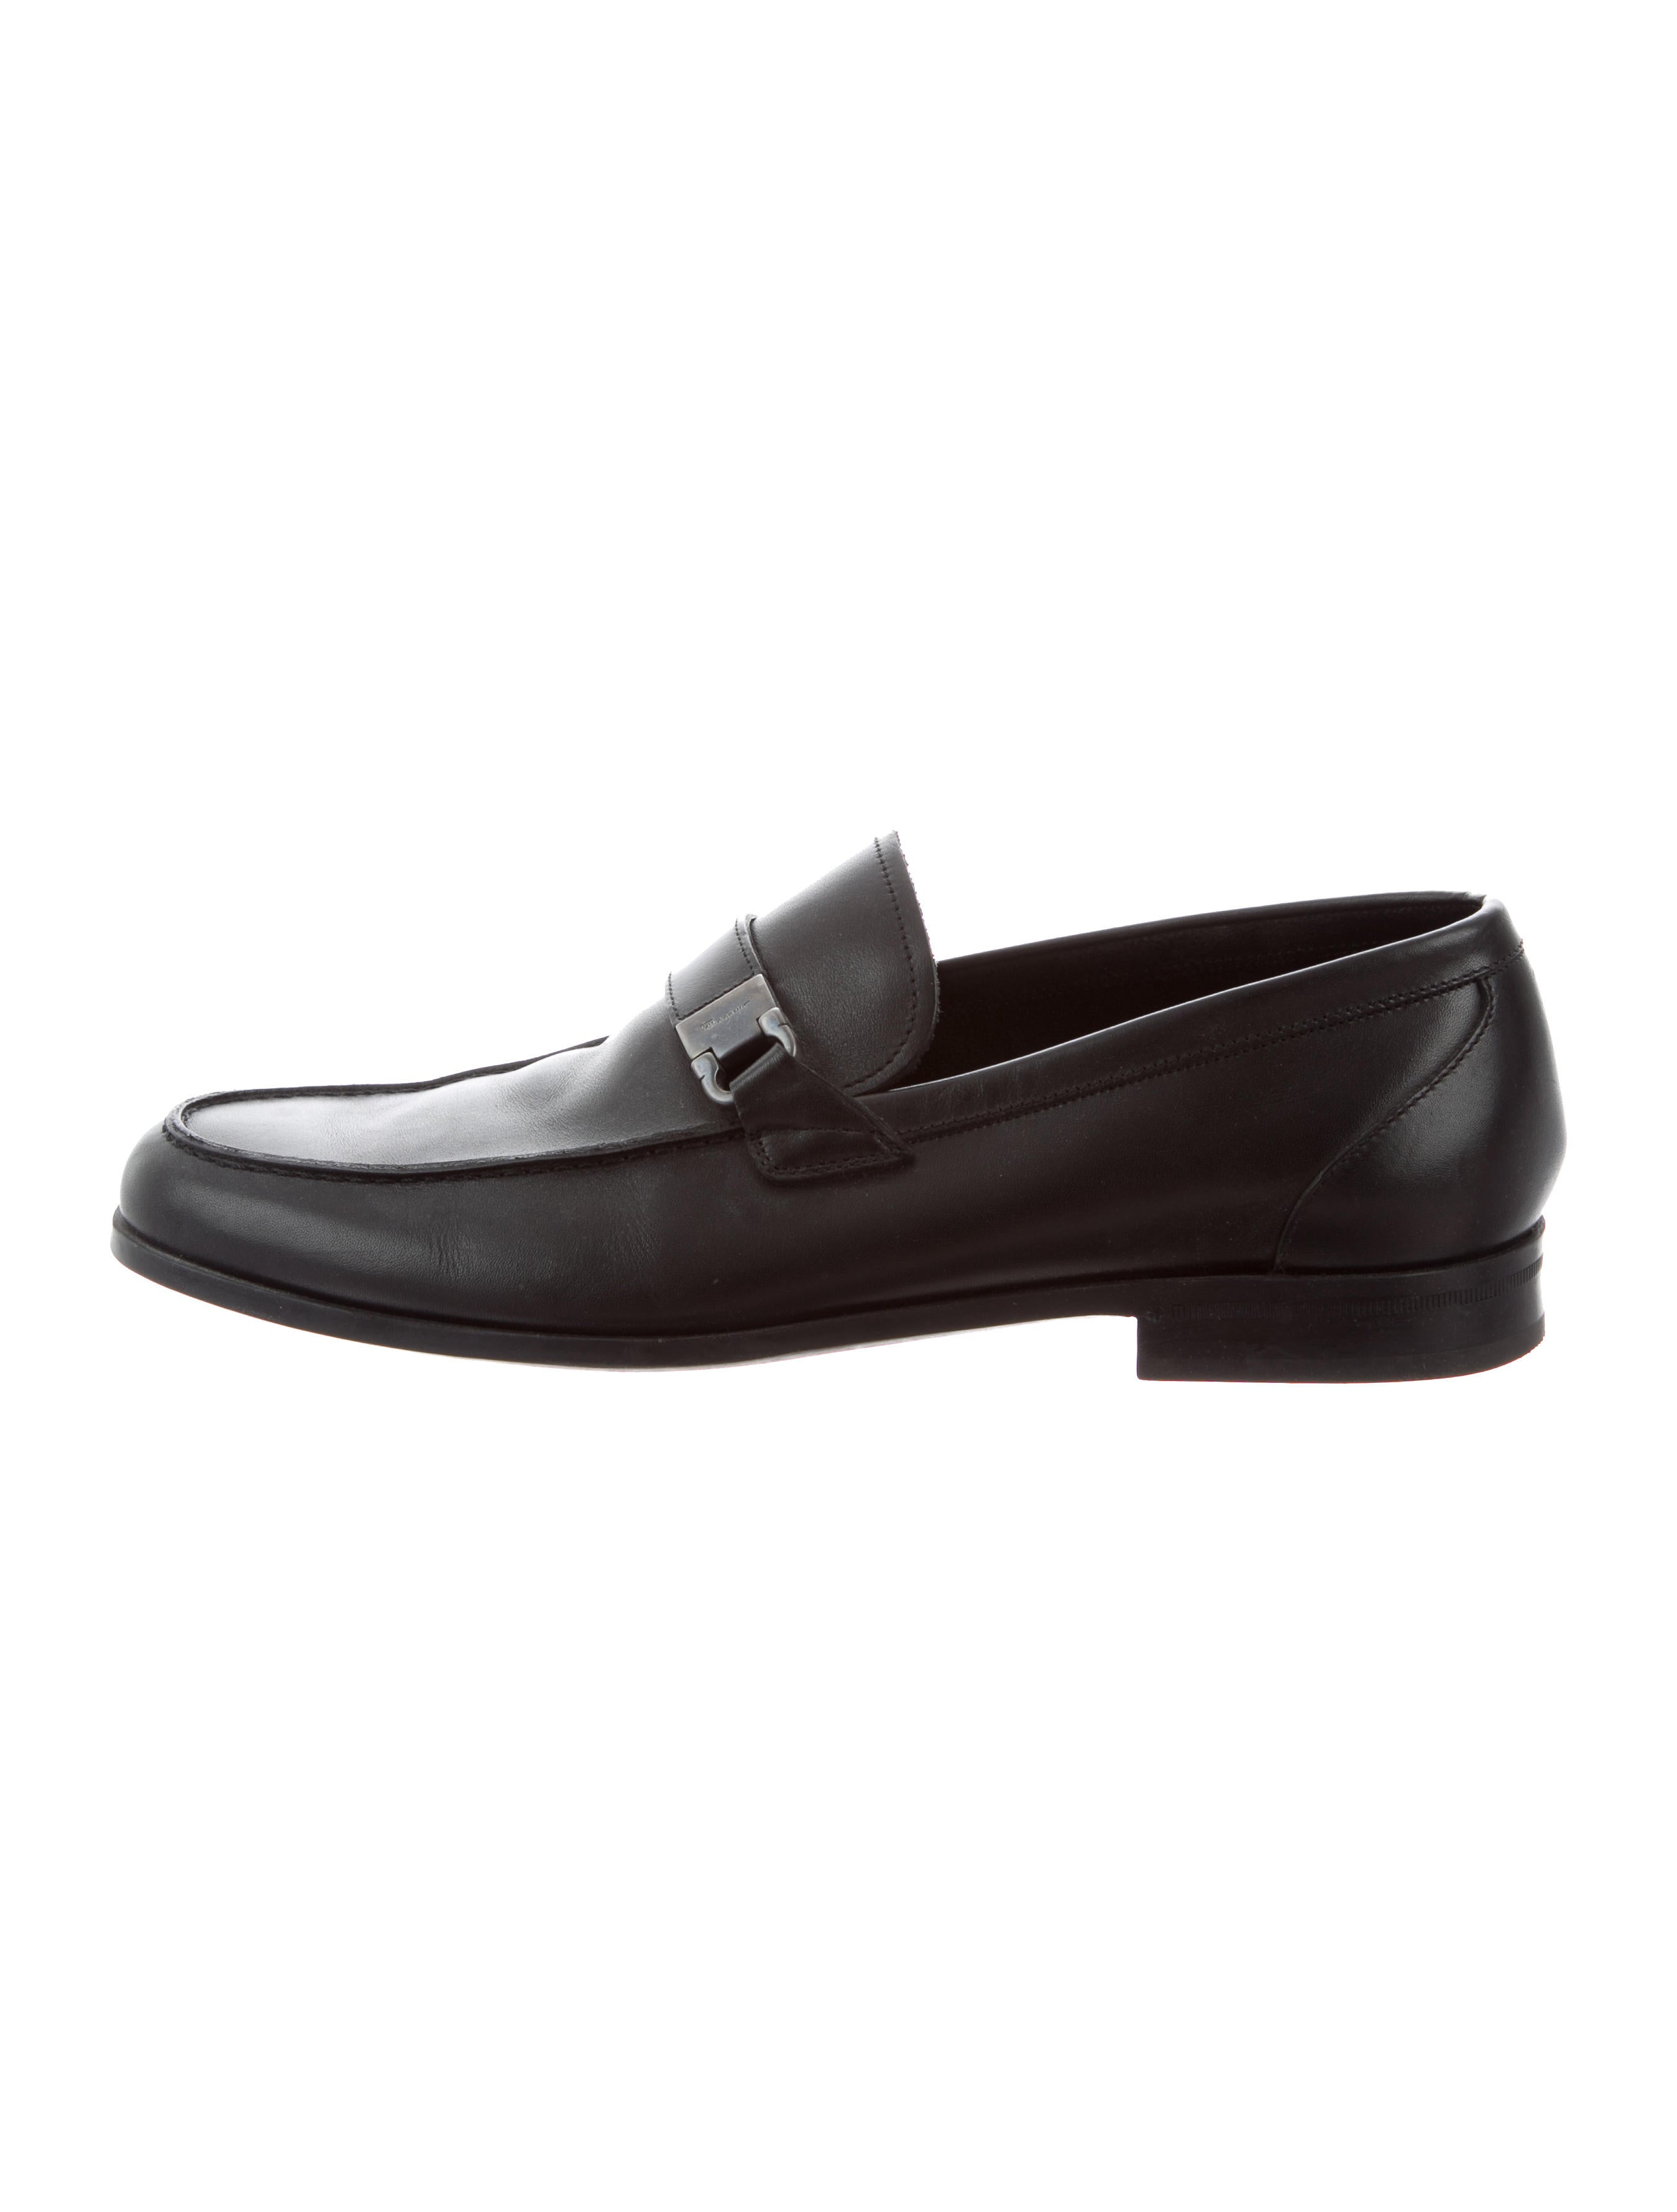 Salvatore Ferragamo Leather Round-Toe Loafers cheap sale 2015 new cheap sale websites XEVM6d689